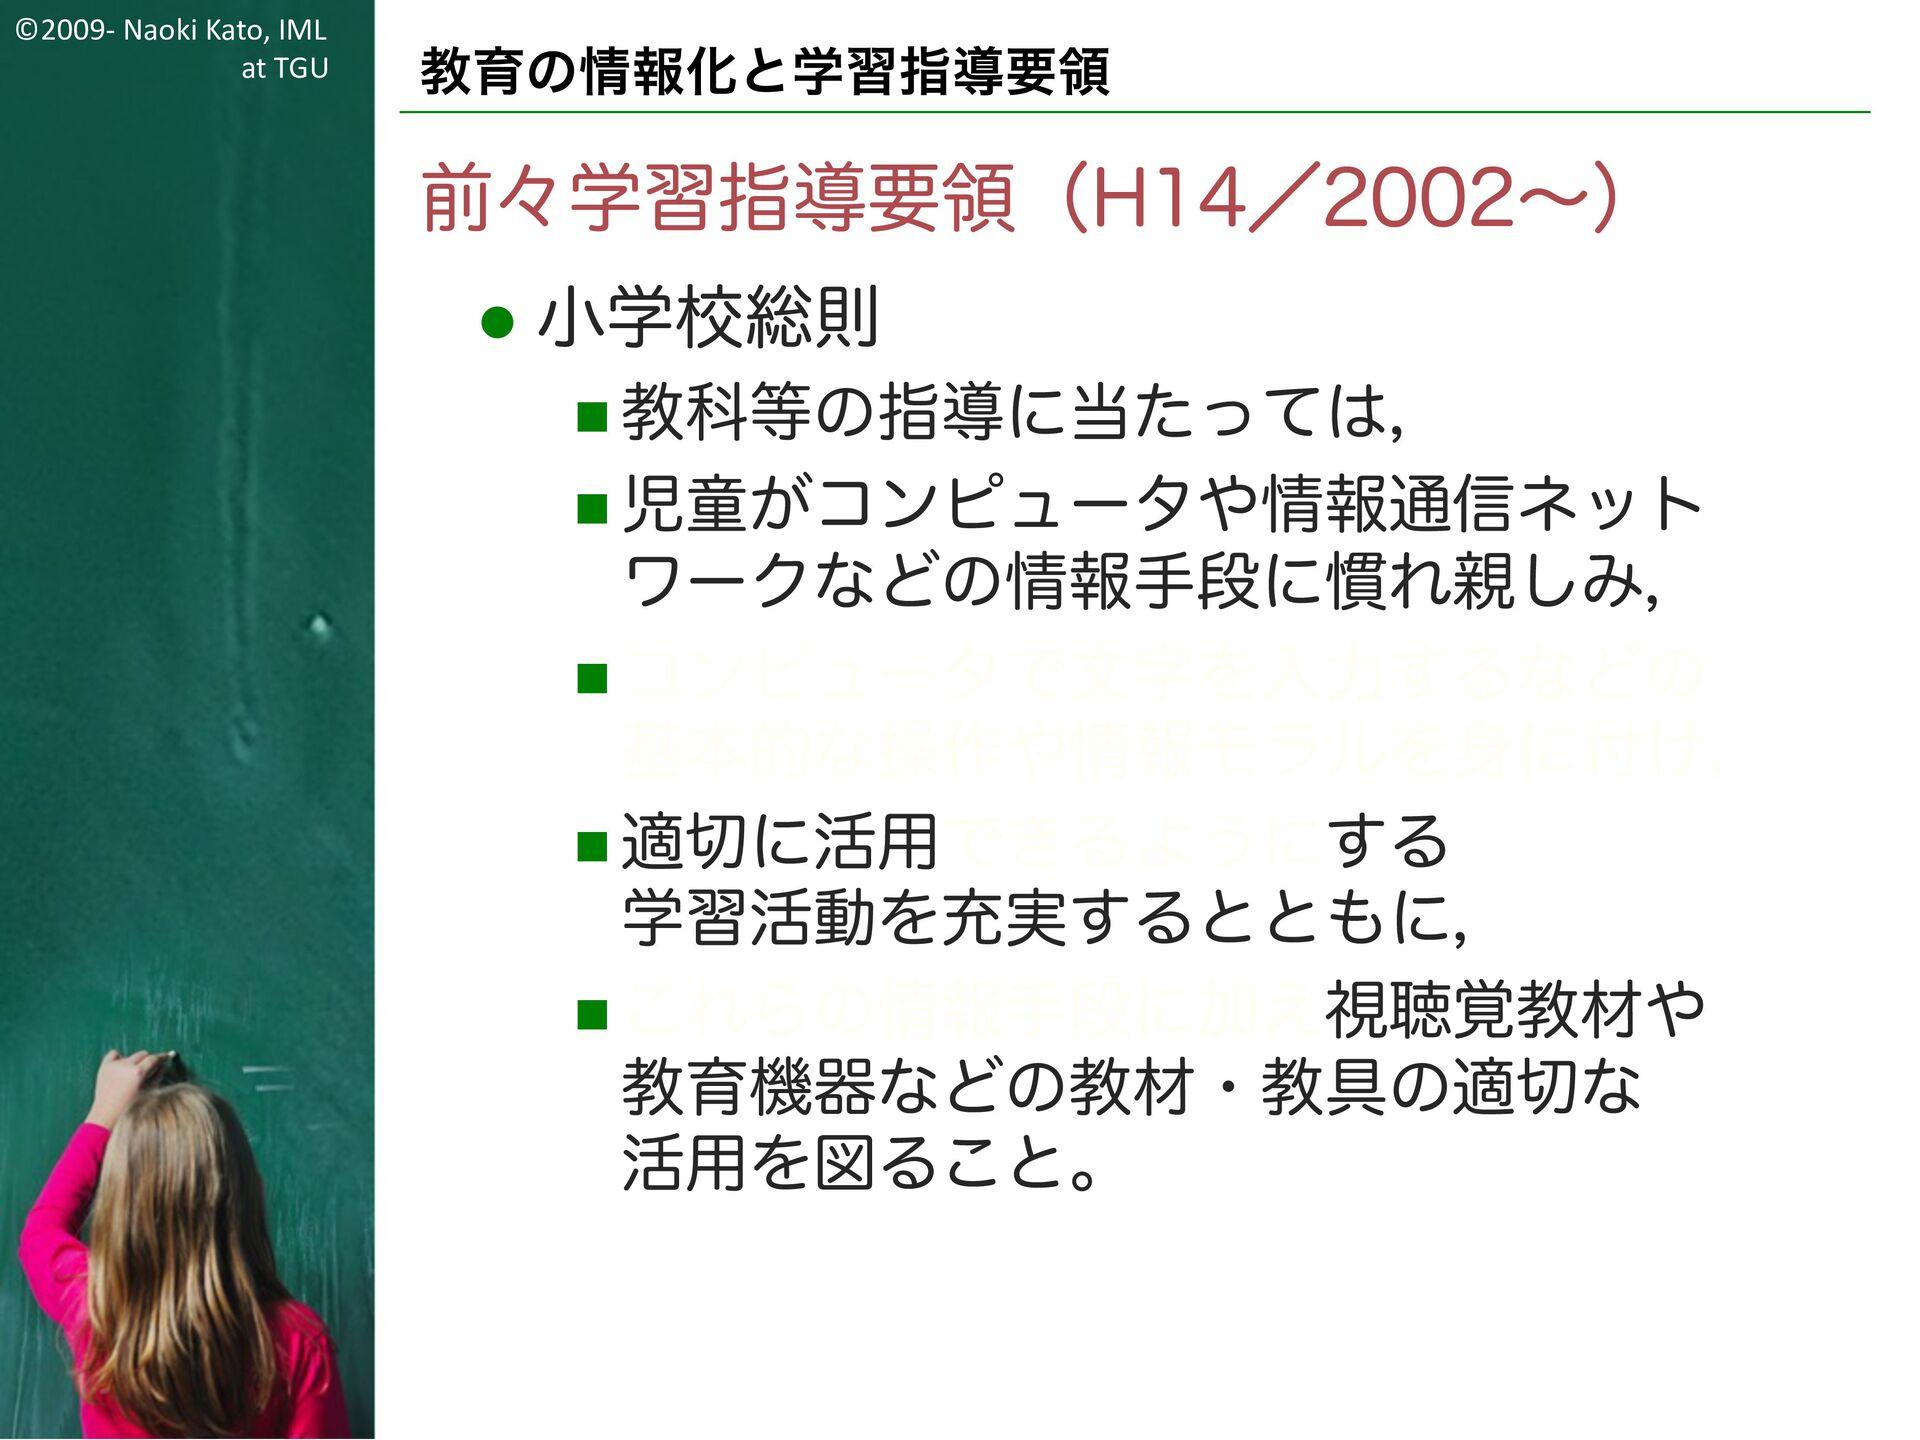 ©2009- Naoki Kato, IML at TGU 教育の情報化と学習指導要領 前学習...